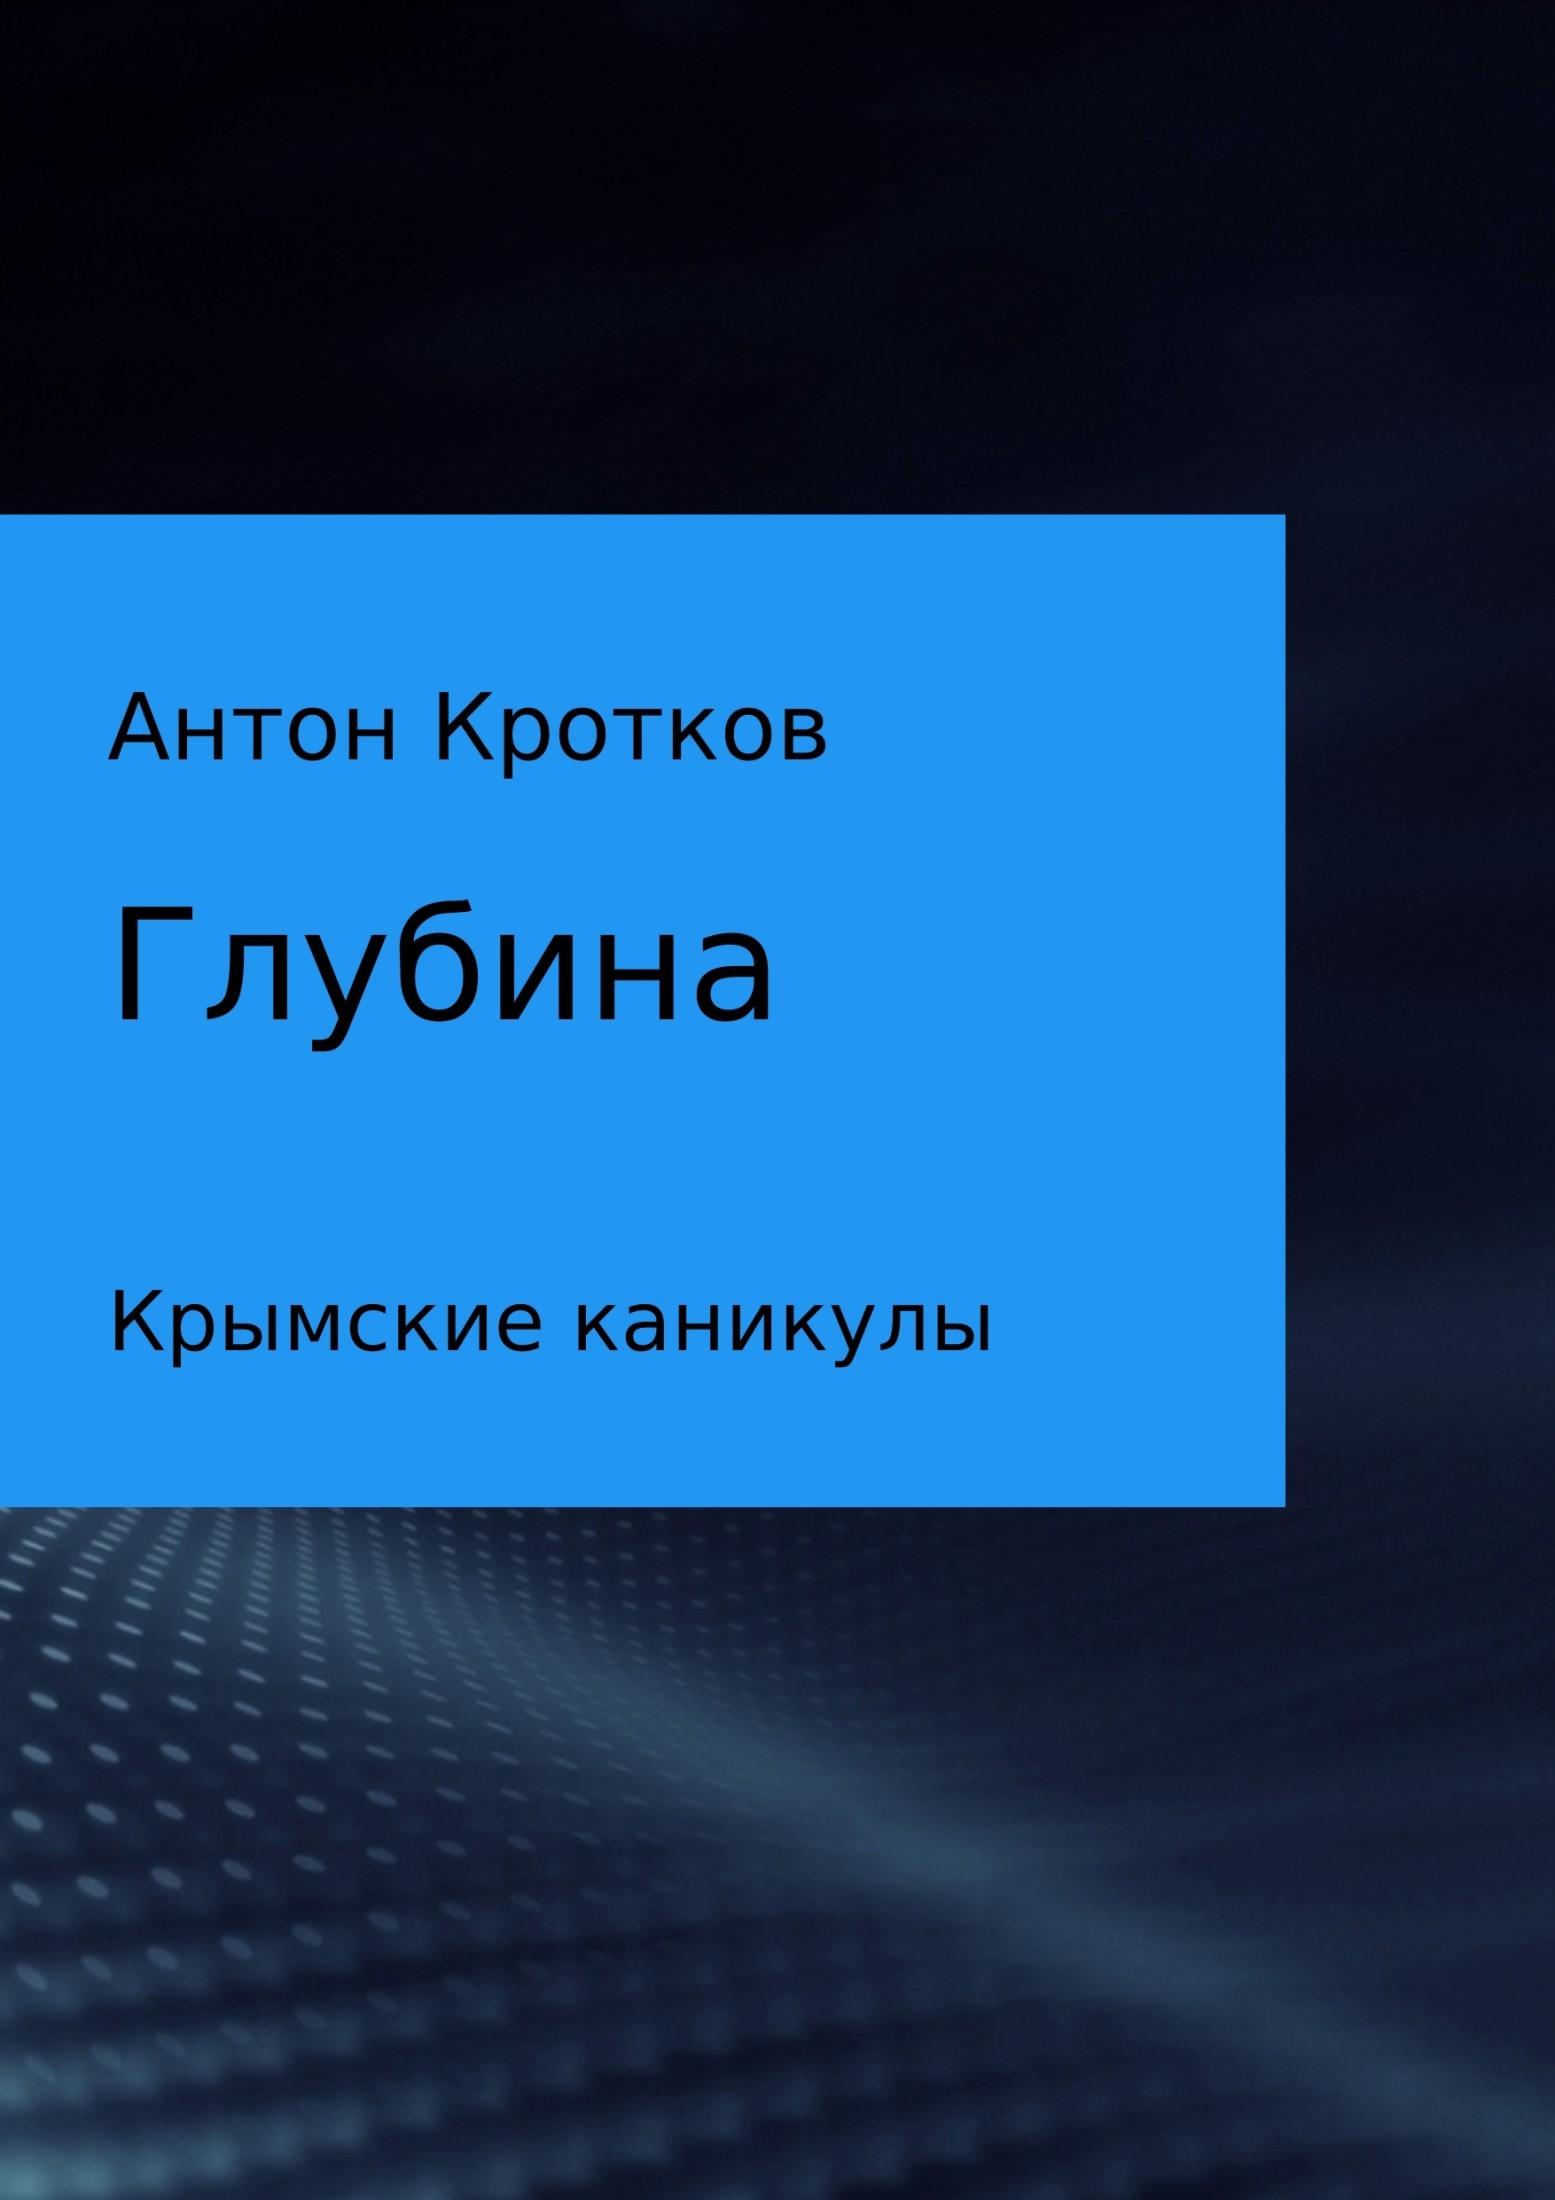 Антон Павлович Кротков Глубина антон павлович кротков последний вираж штрафбата